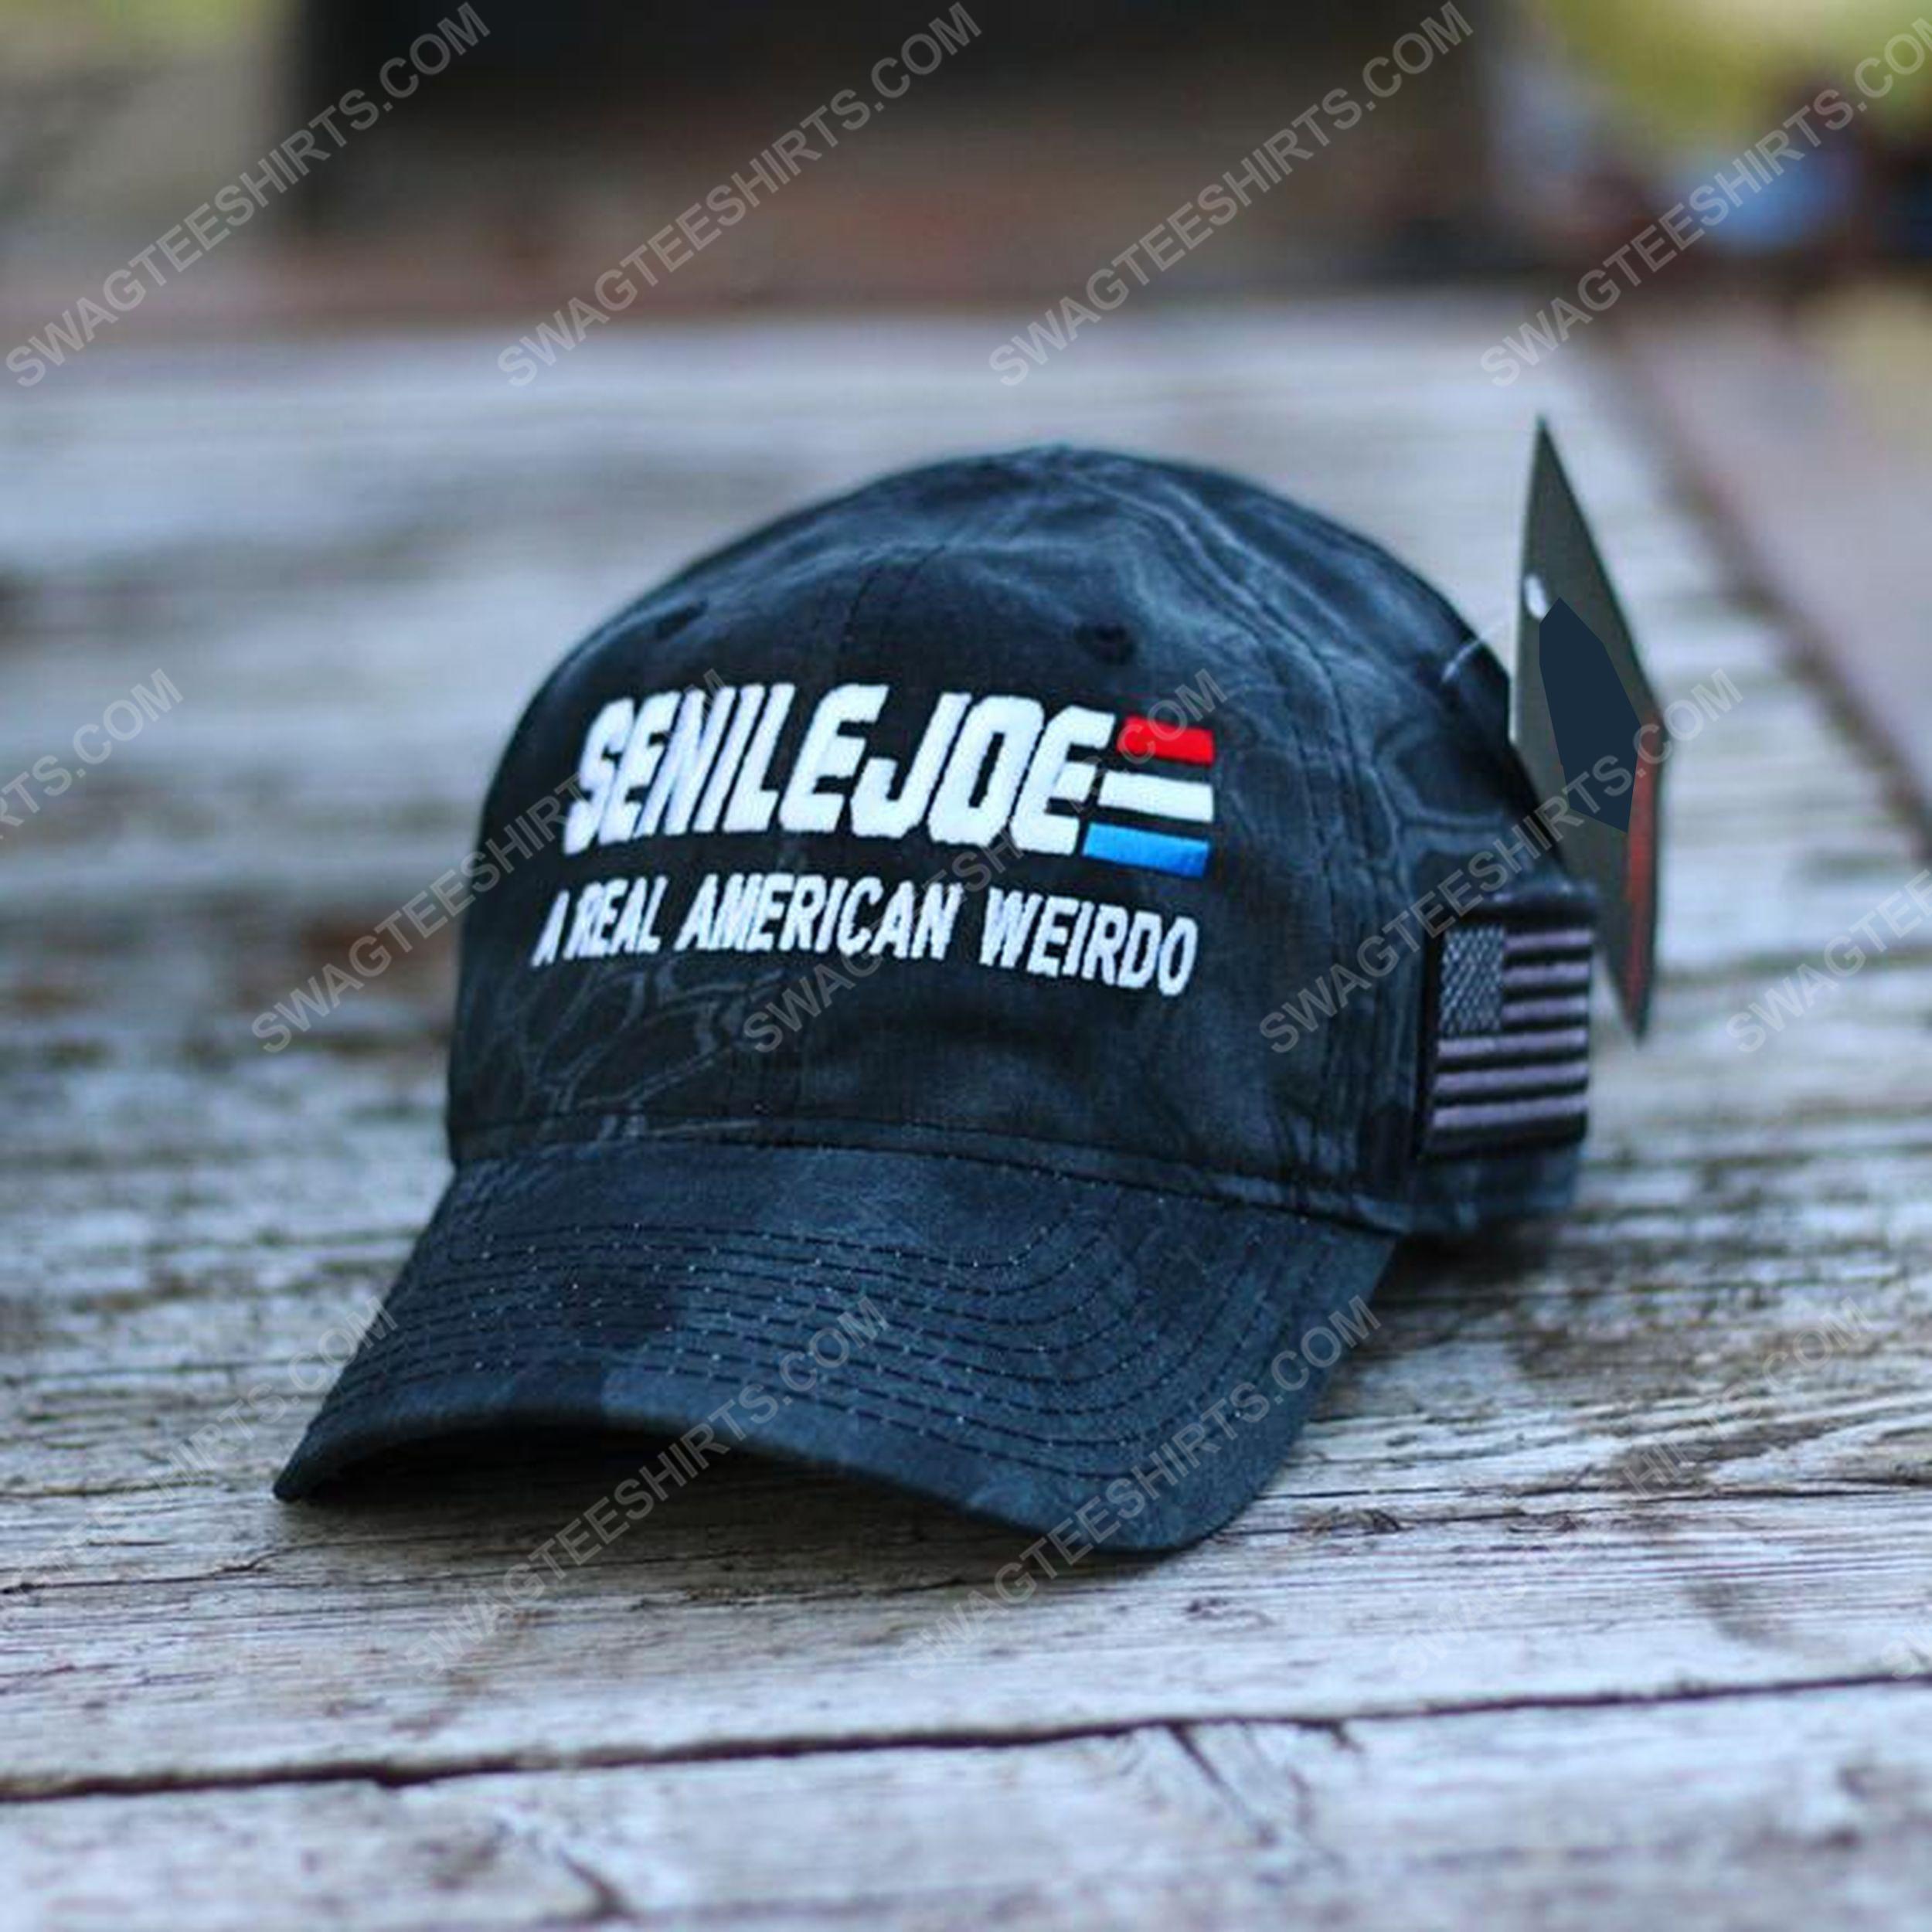 Senile joe a real american weirdo full print classic hat 1 - Copy (3)